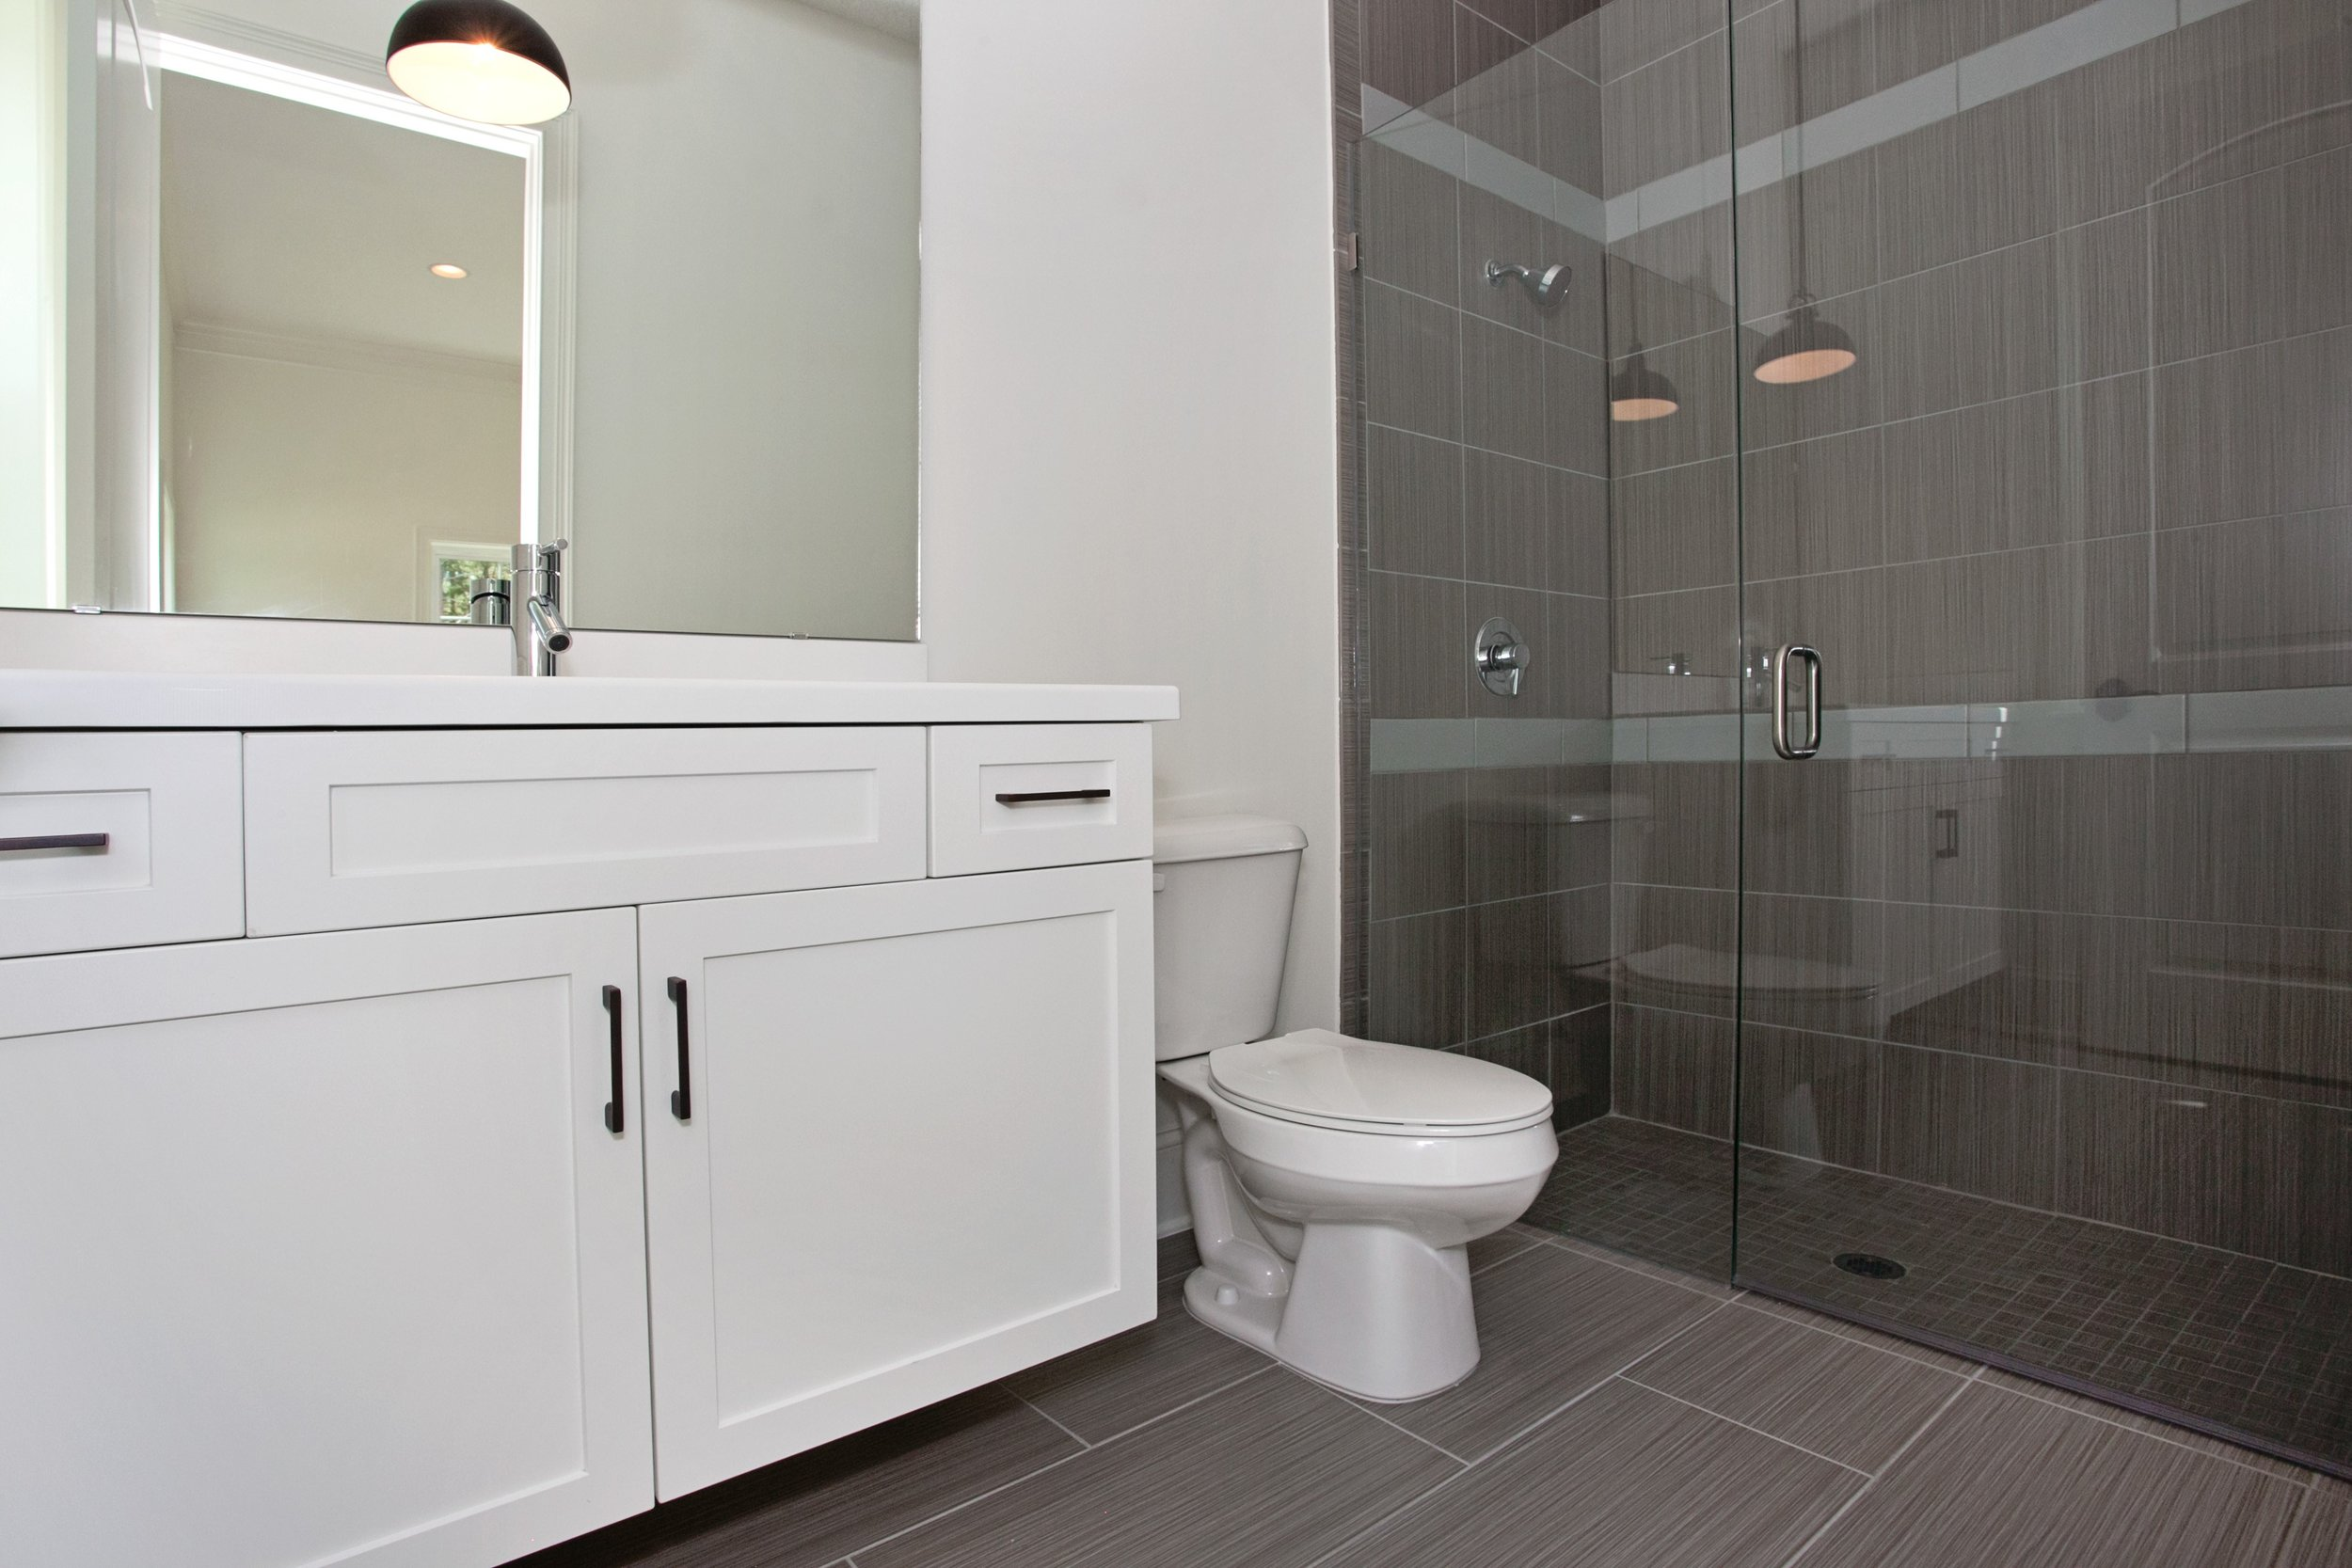 038_Bathroom.jpg